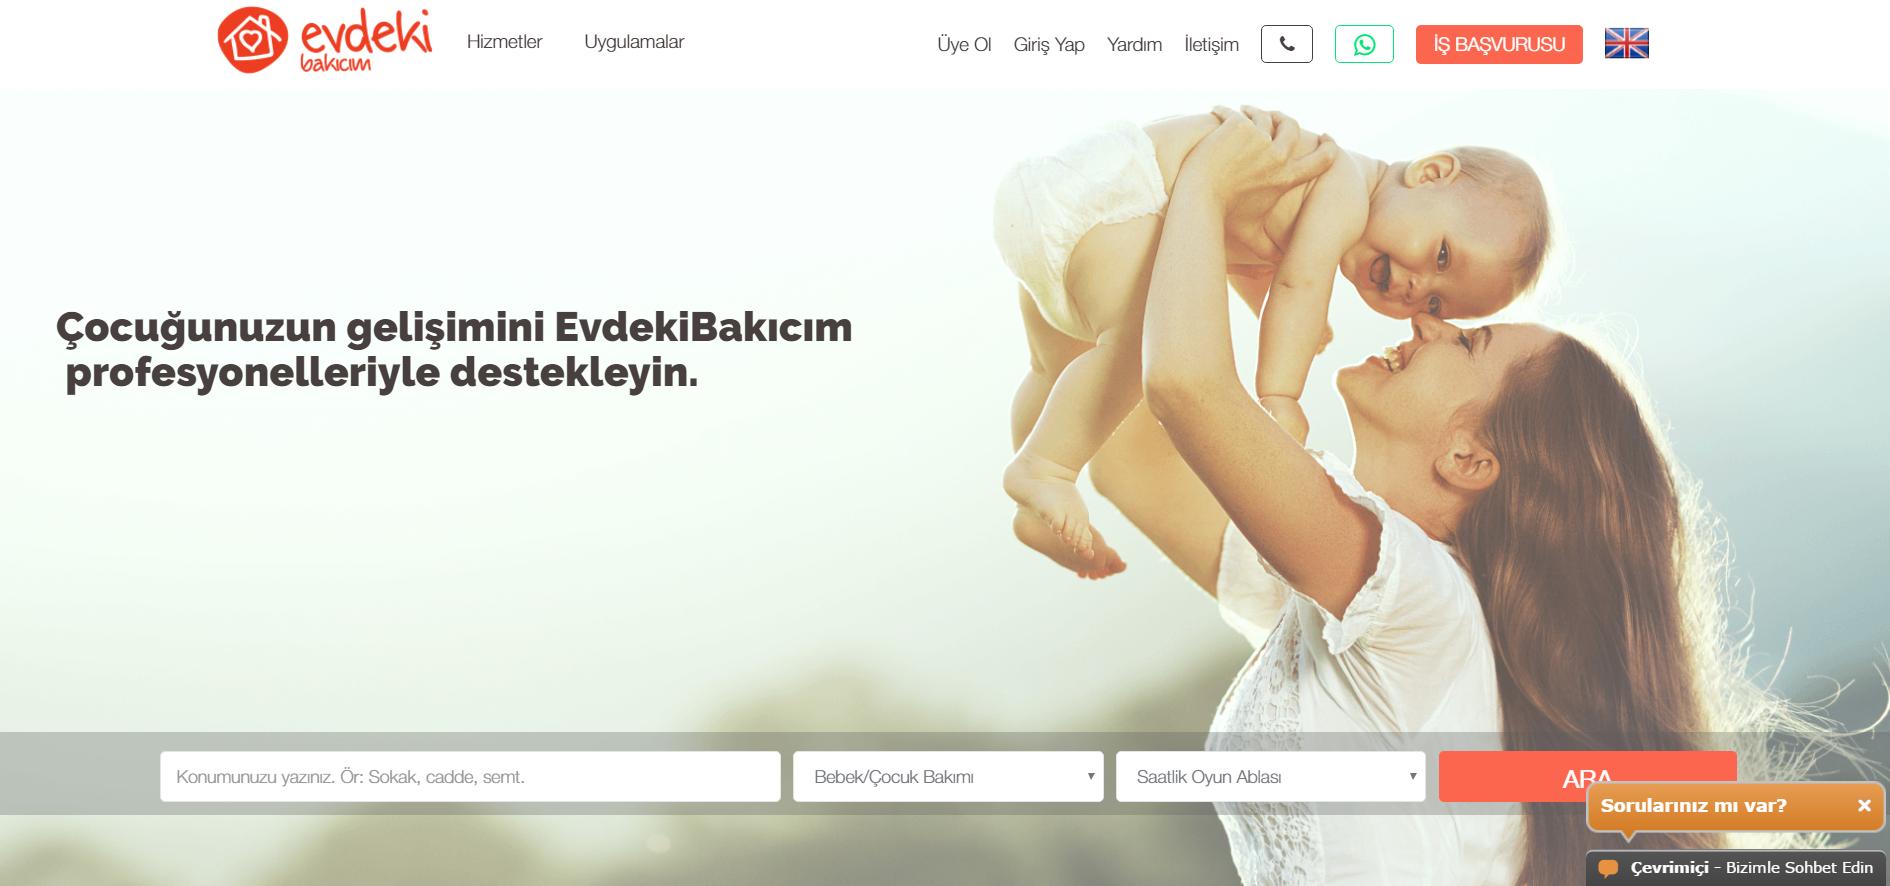 Webrazzi Arena winner Evdekibakicim gets $180K angel investment